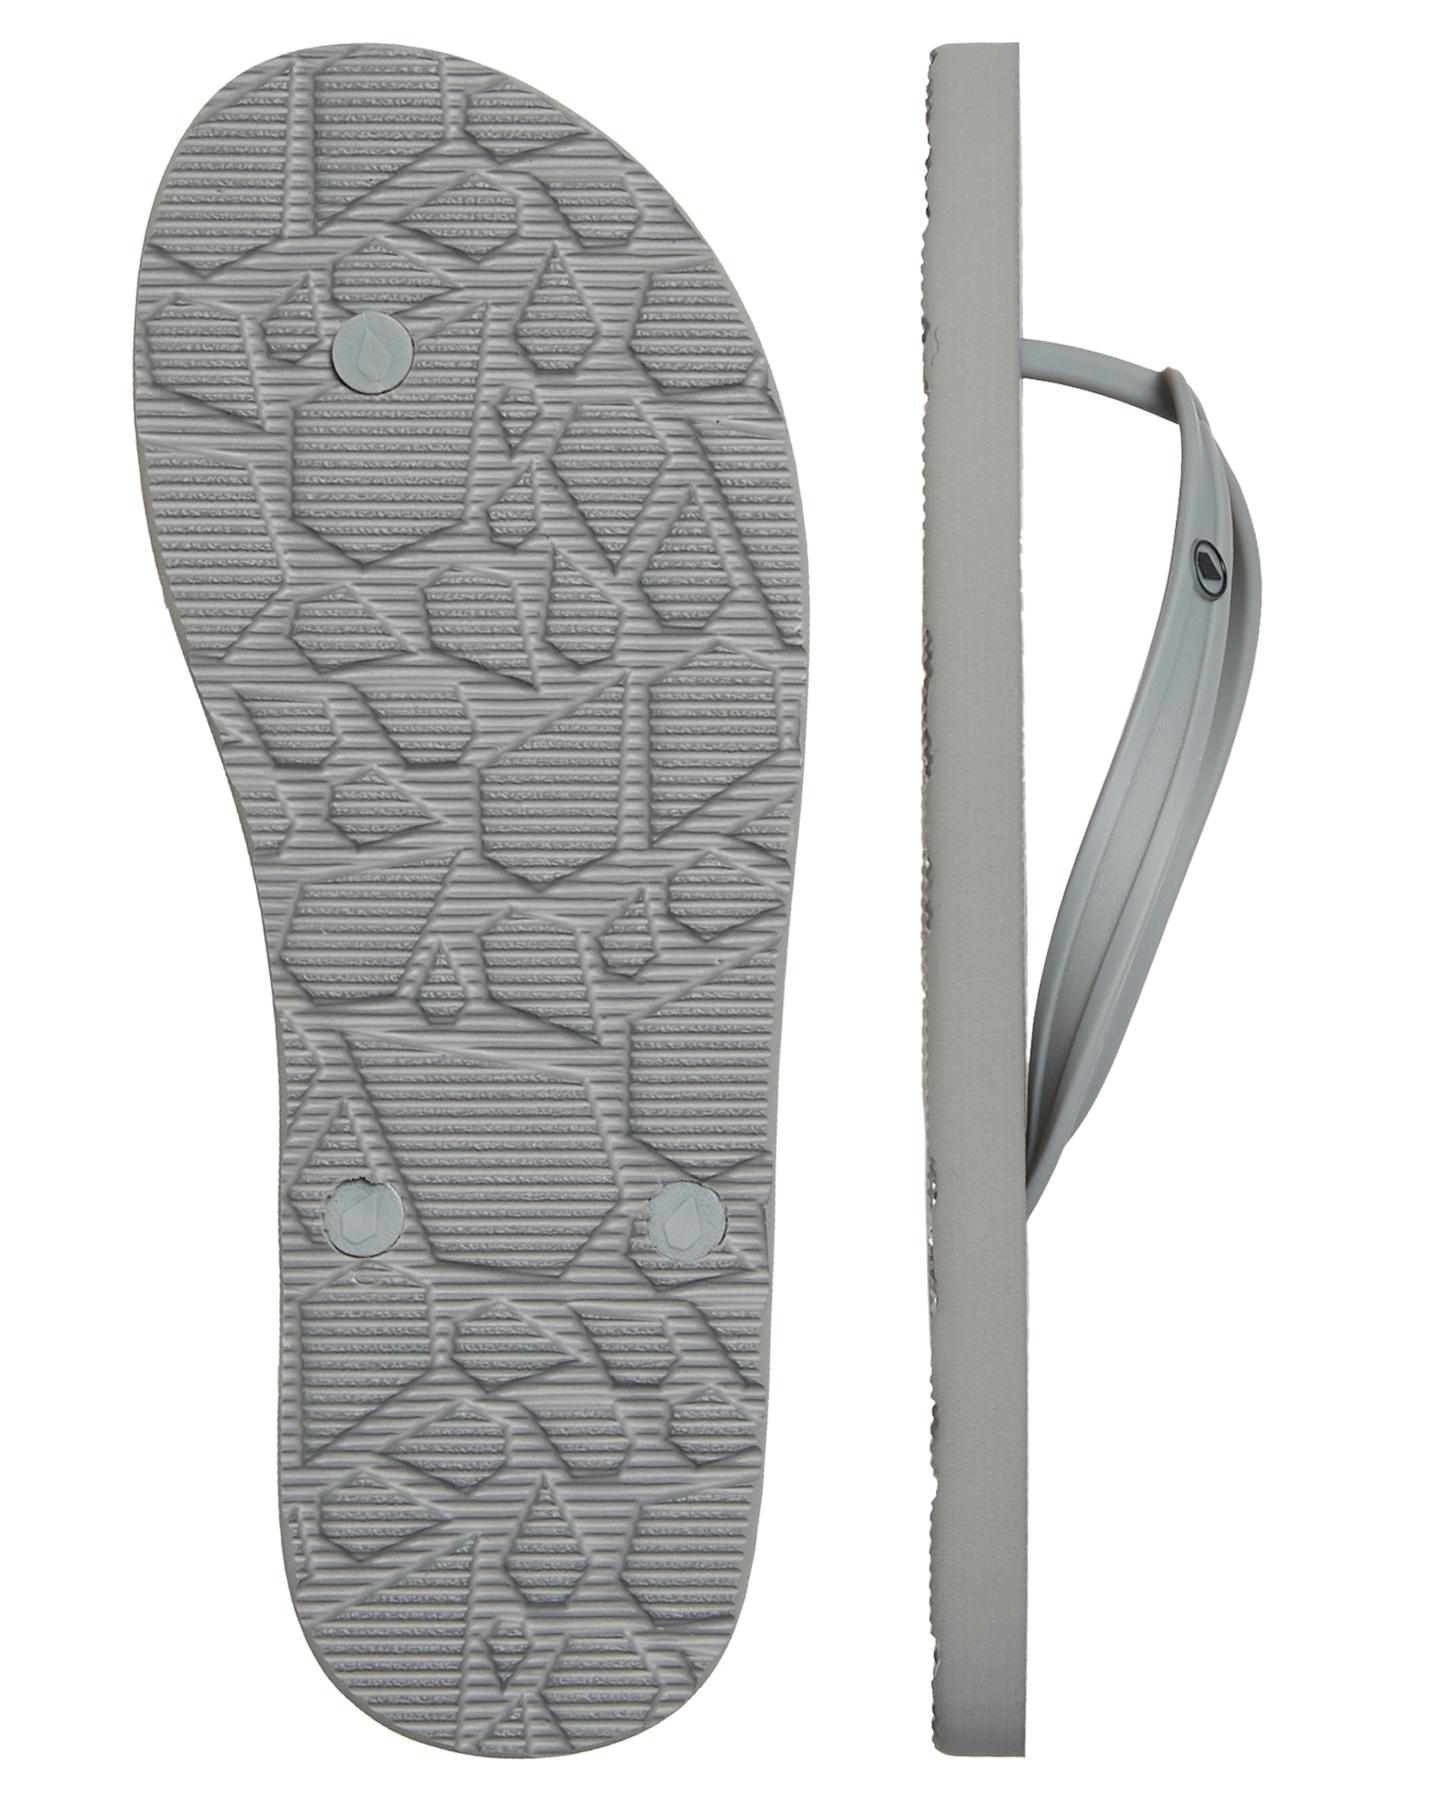 913affeb5 New Volcom Men s Rocker 2 Solid Thong Rubber Pu Grey